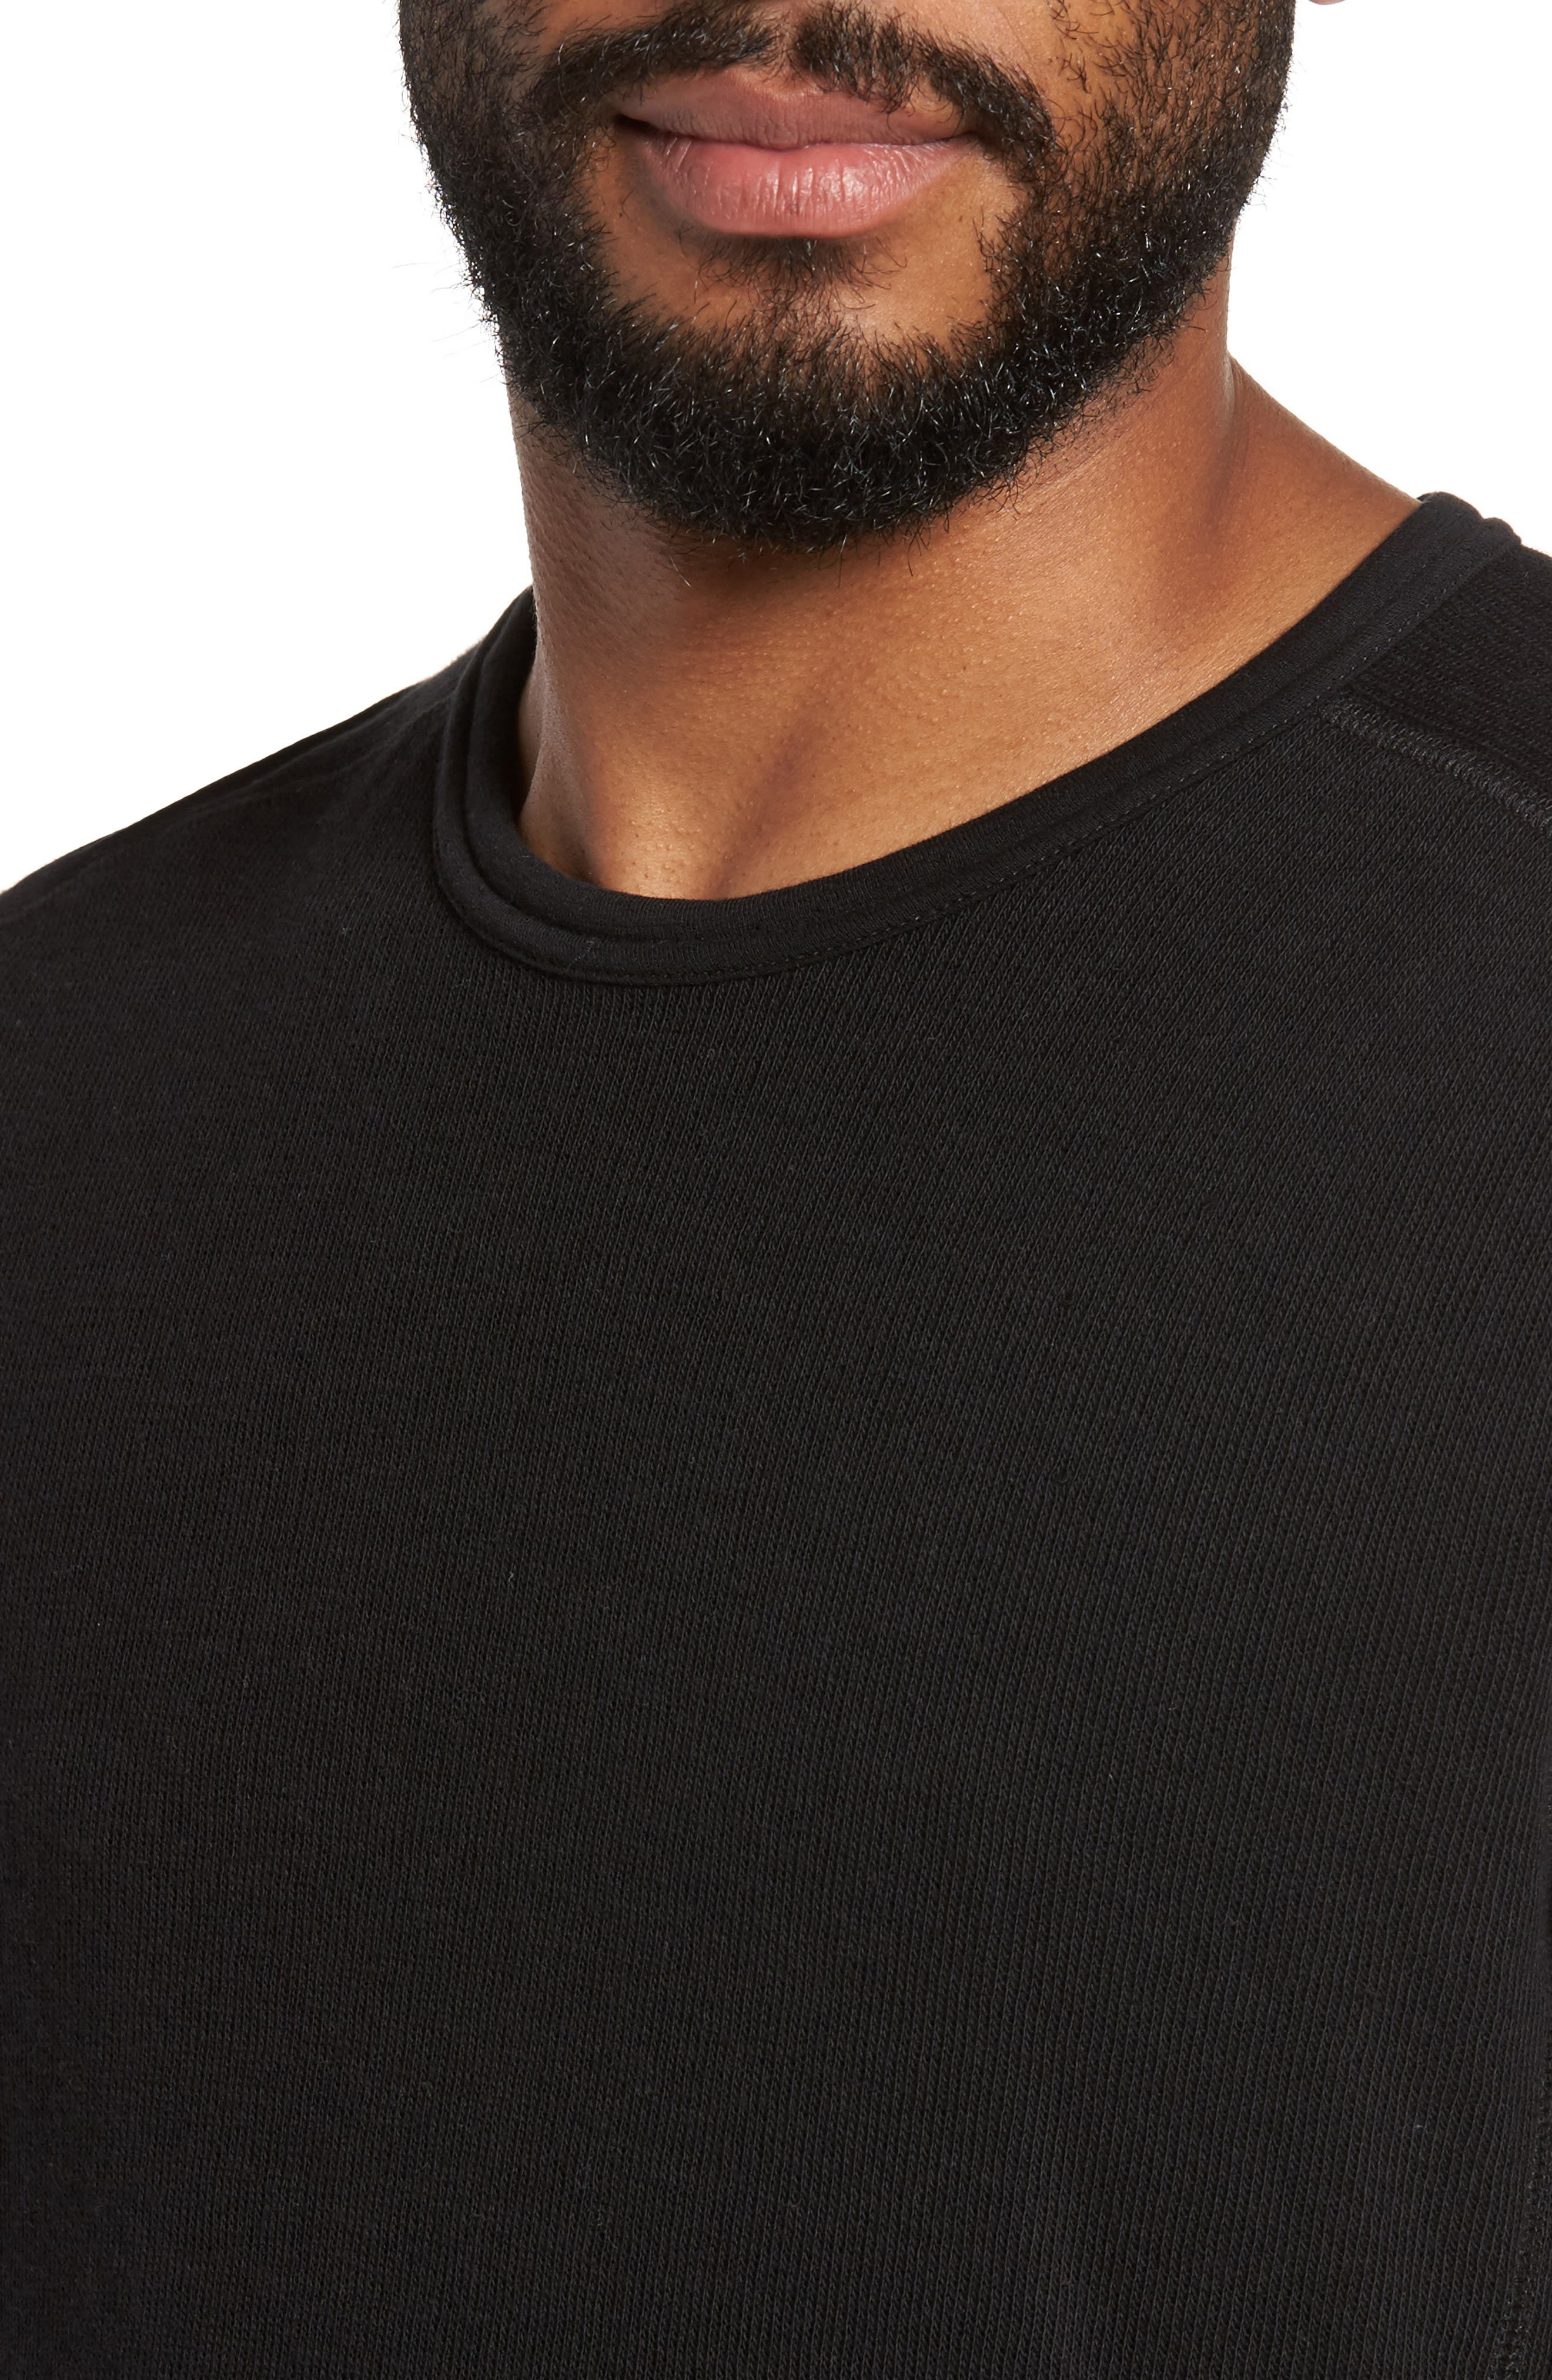 Double Knit Long Sleeve T-Shirt,                             Alternate thumbnail 4, color,                             BLACK